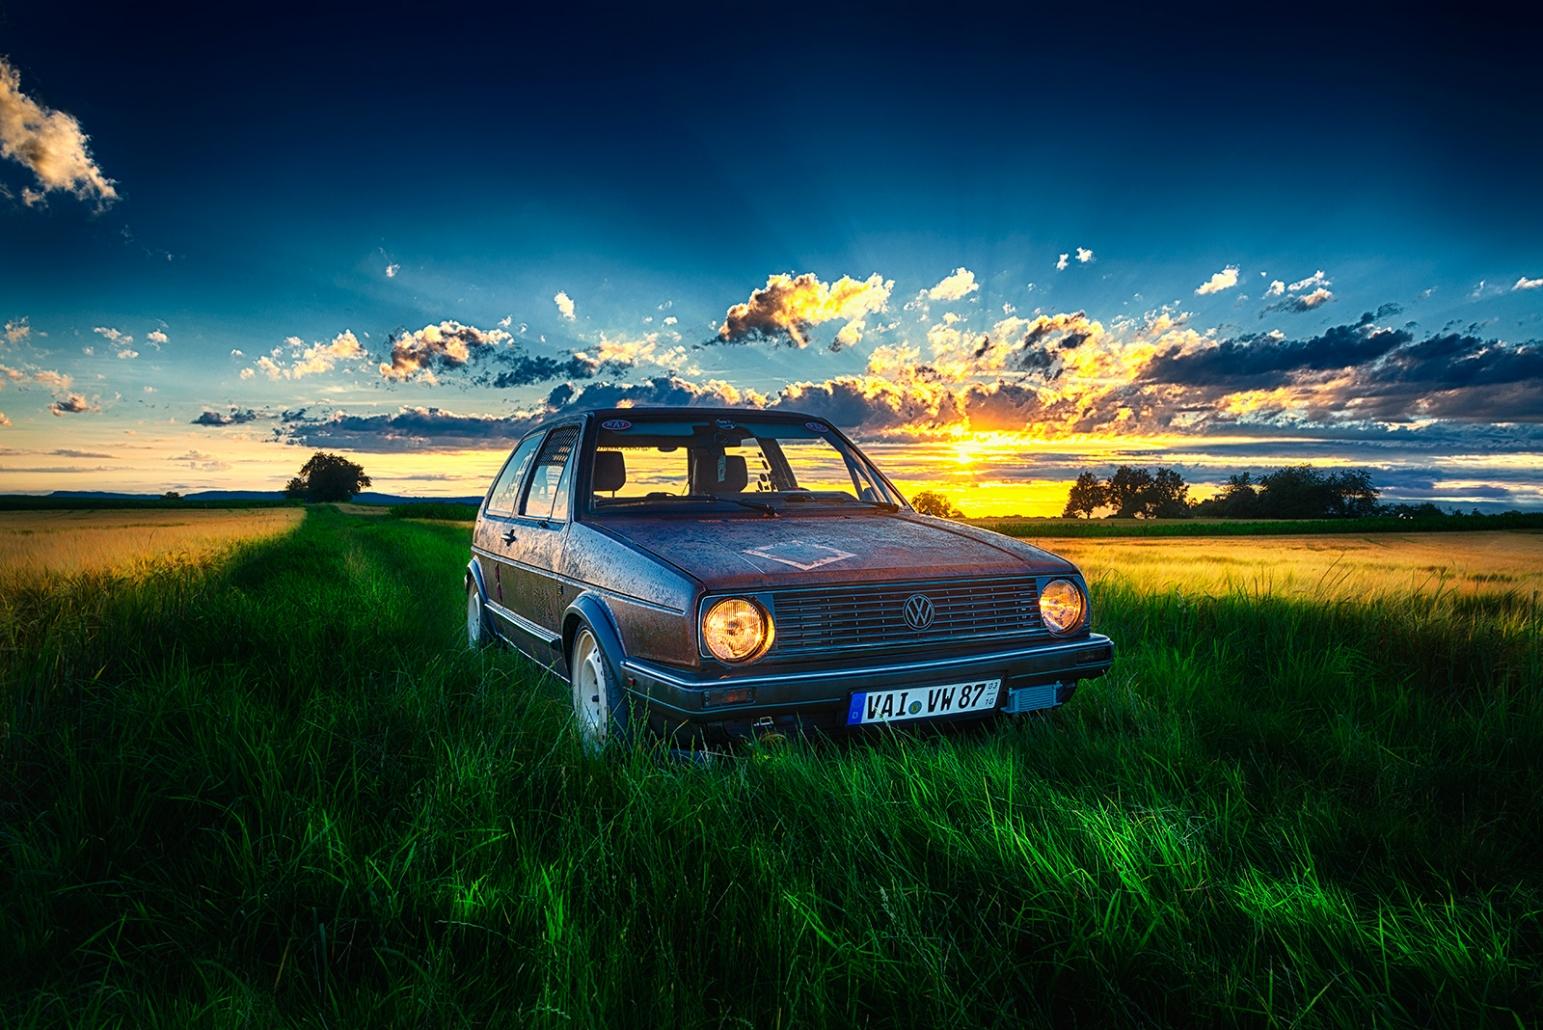 SIGADesign Fotografie Landschaft Automotive Produkte